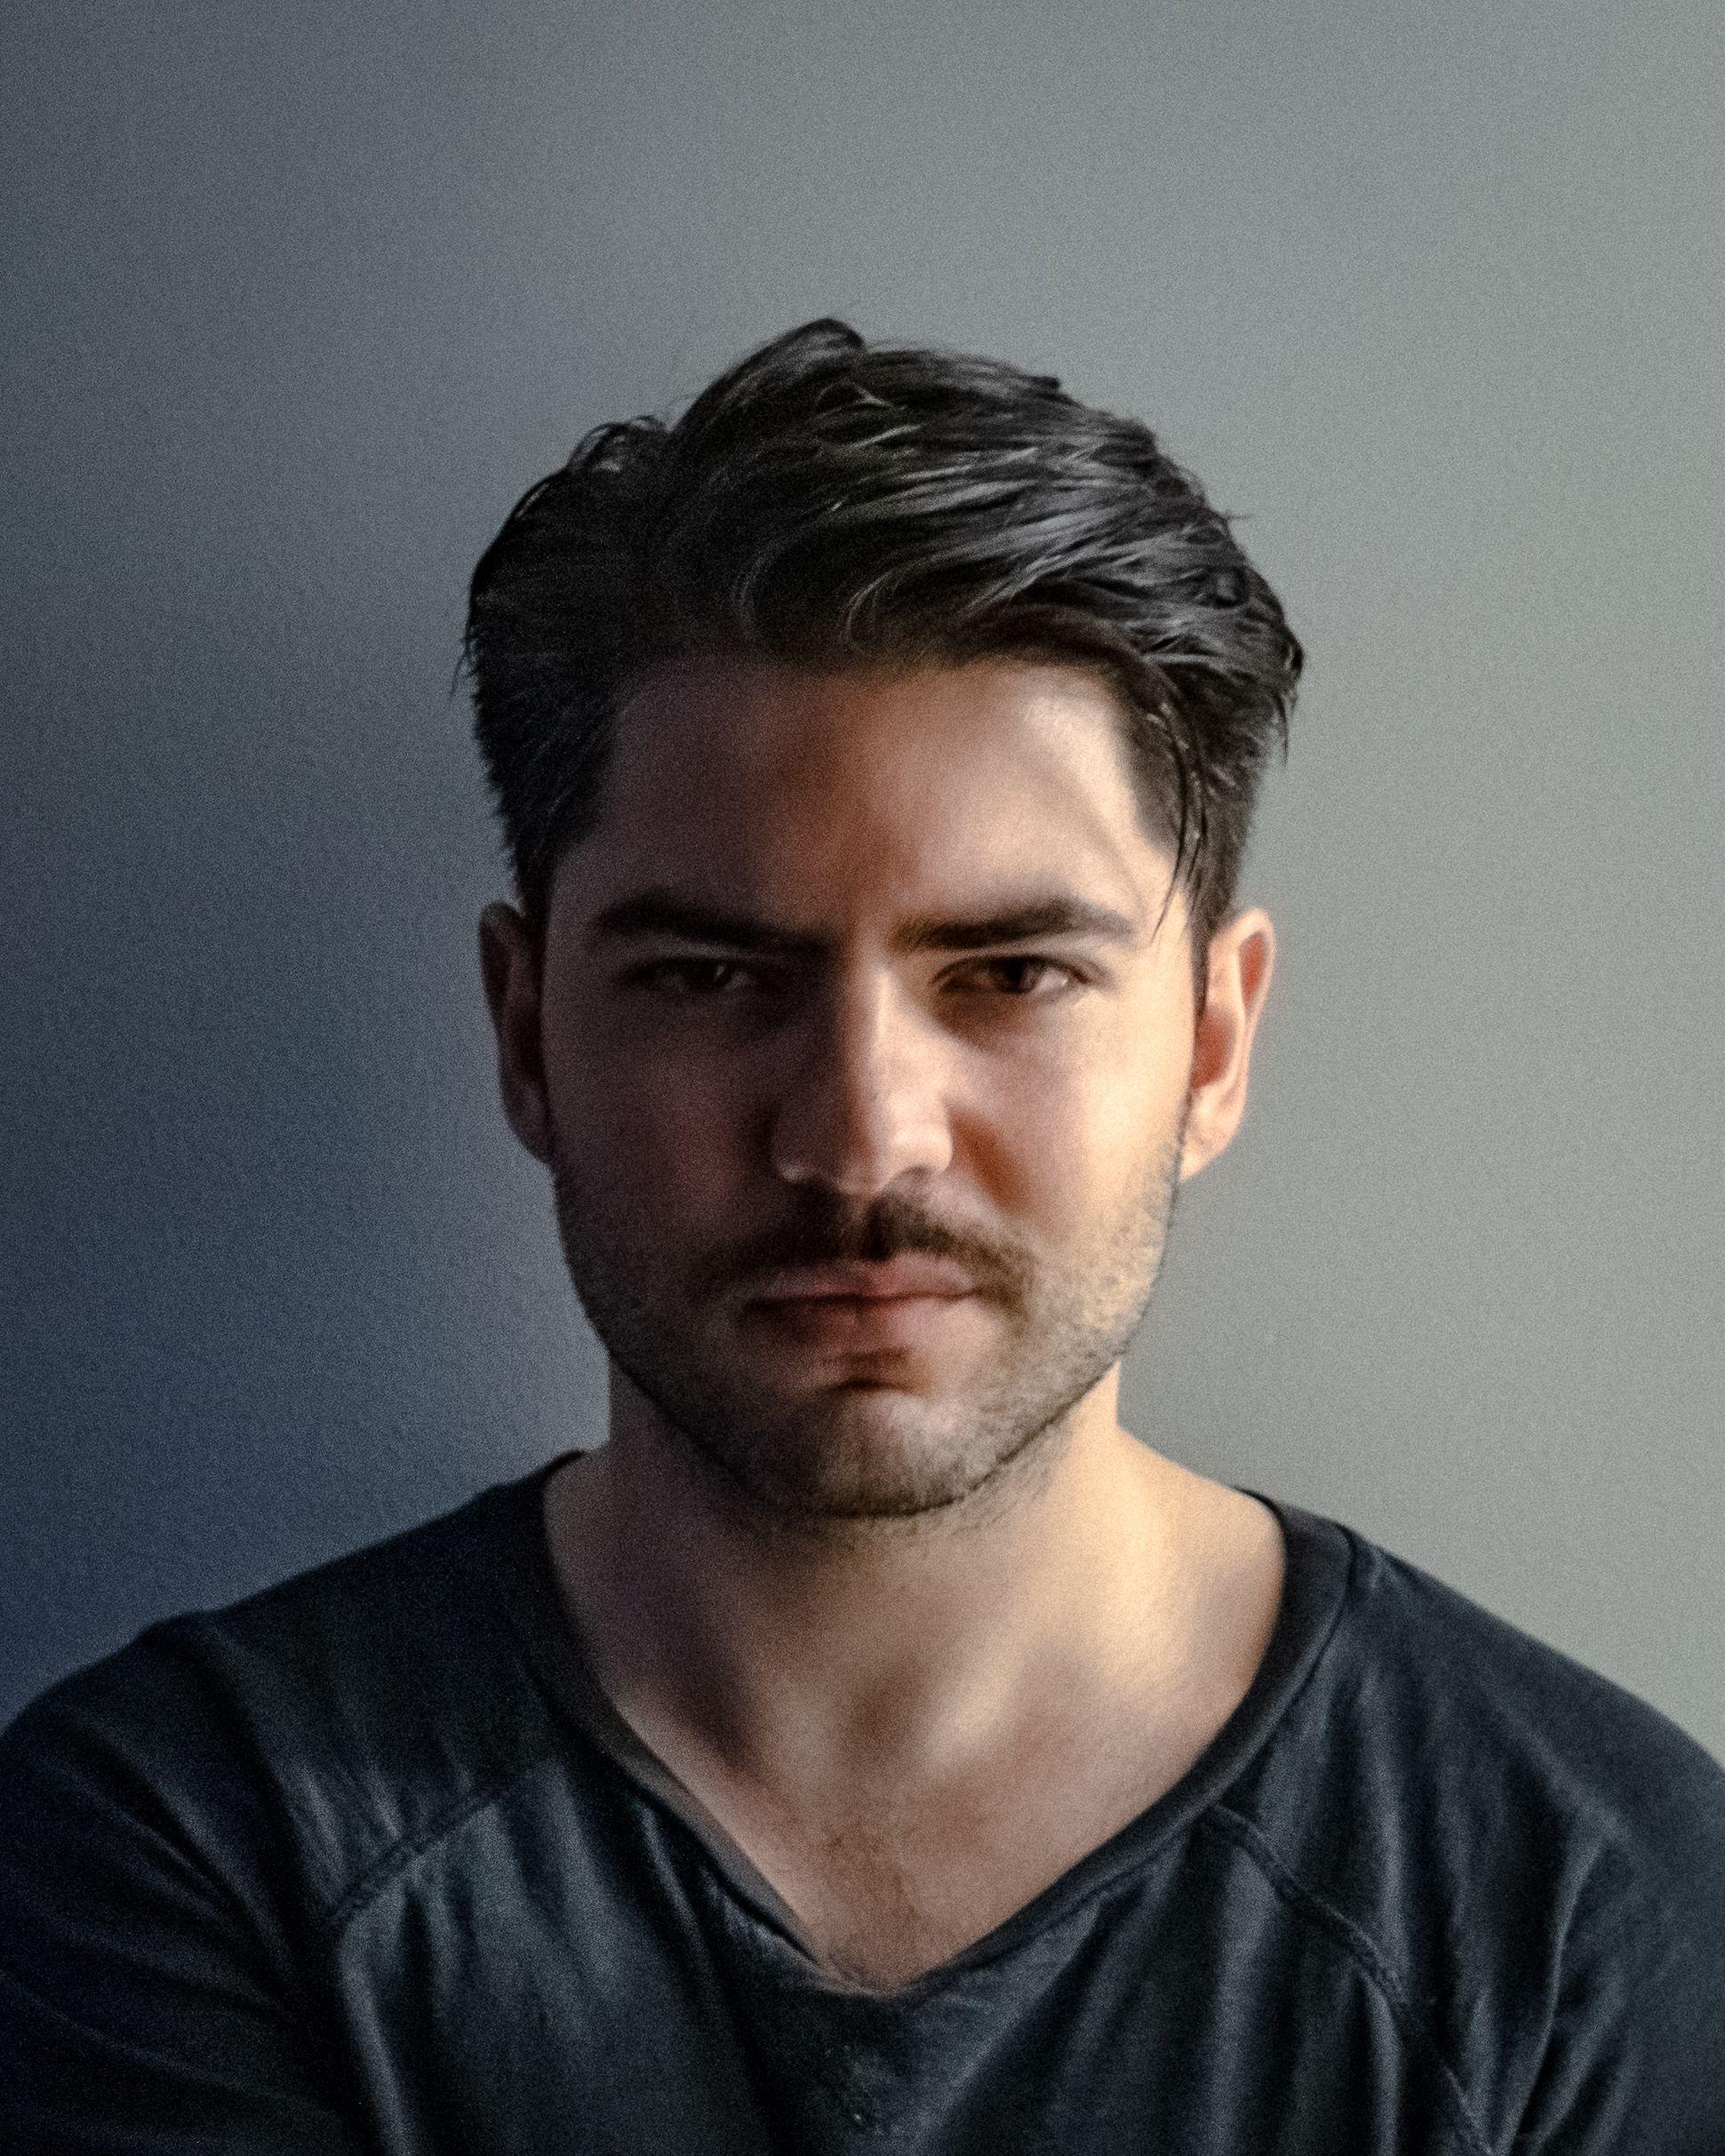 Mehmet Aydın Baytaş